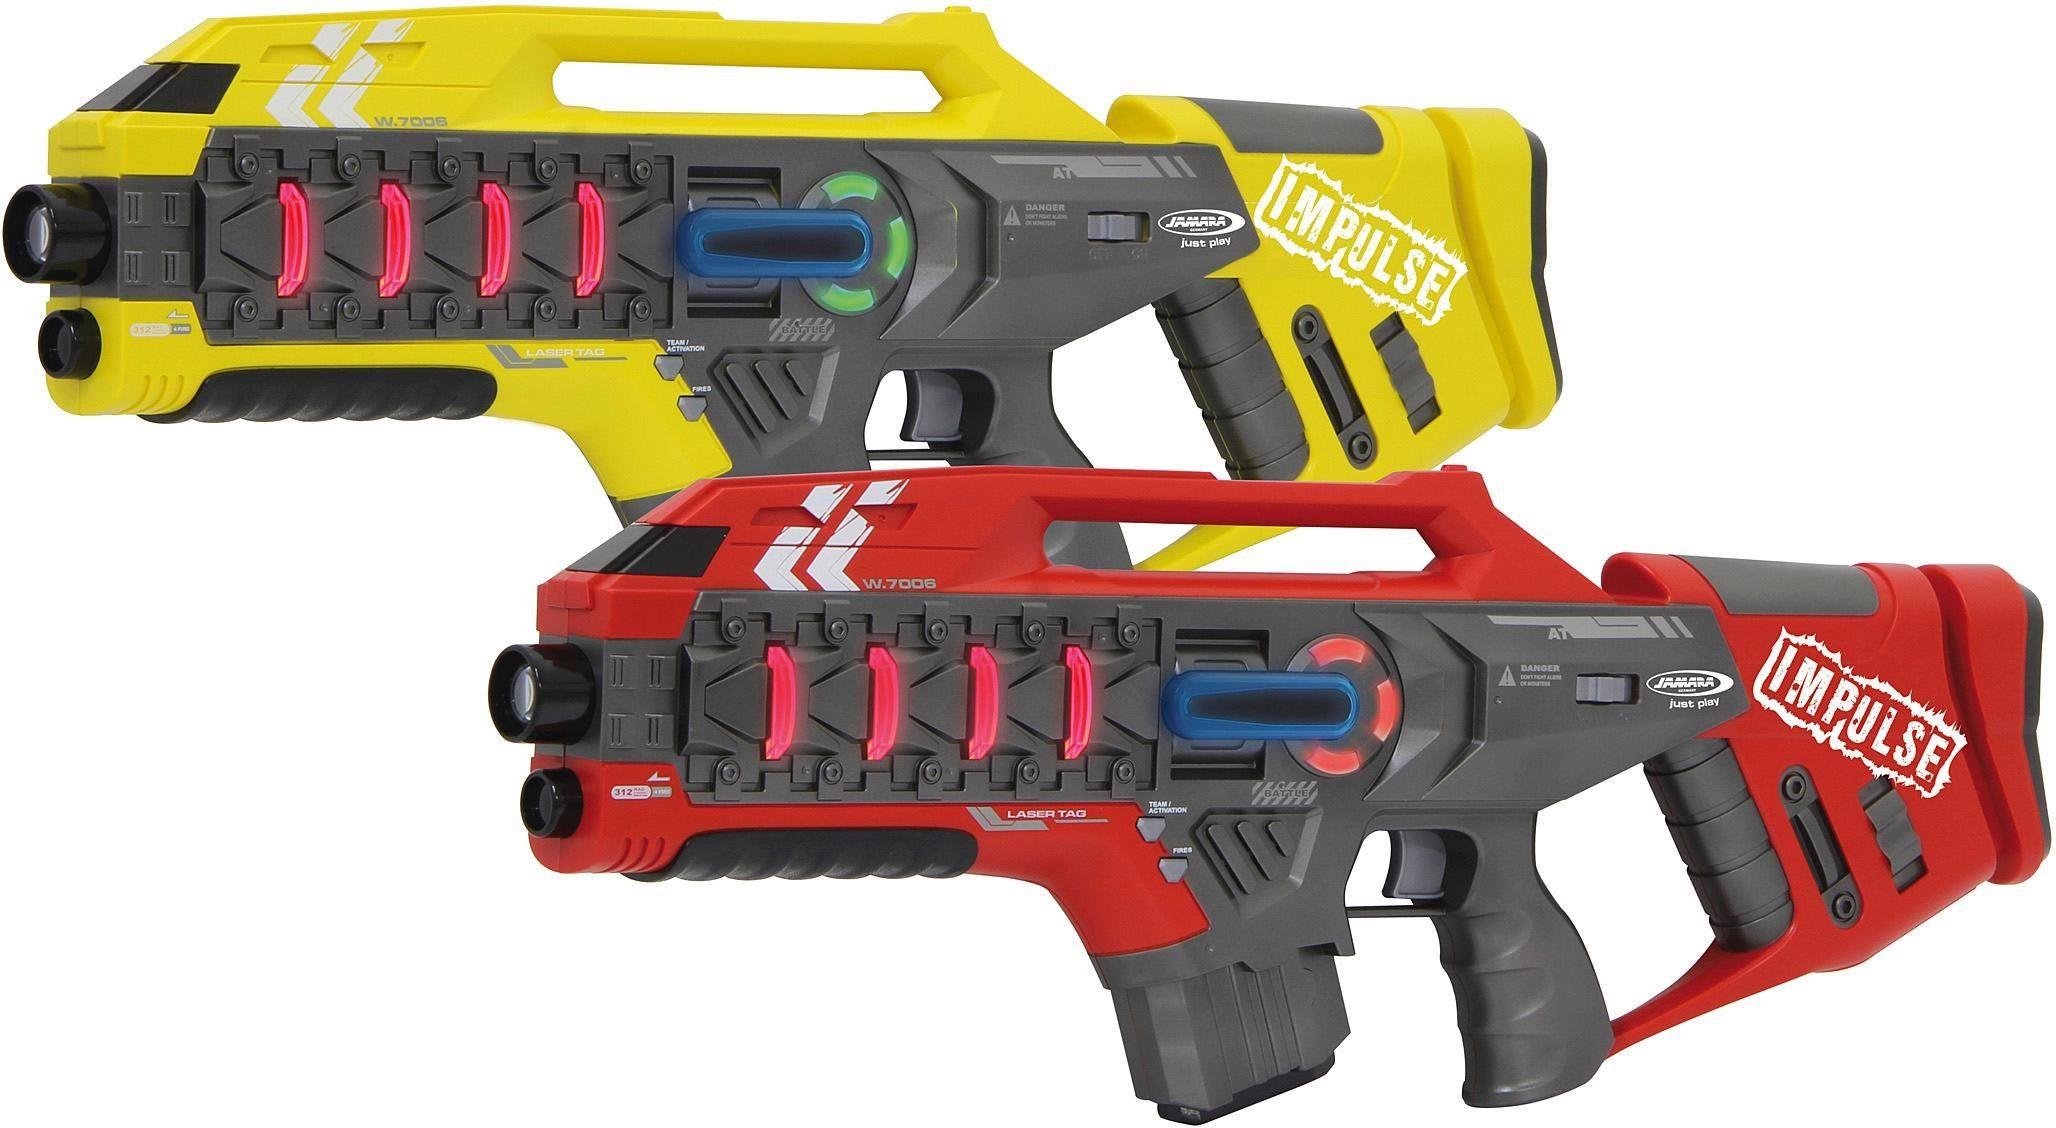 JAMARA Laser Gewehr Set, »Impulse Laser Gun Rifle Set, gelb/rot«